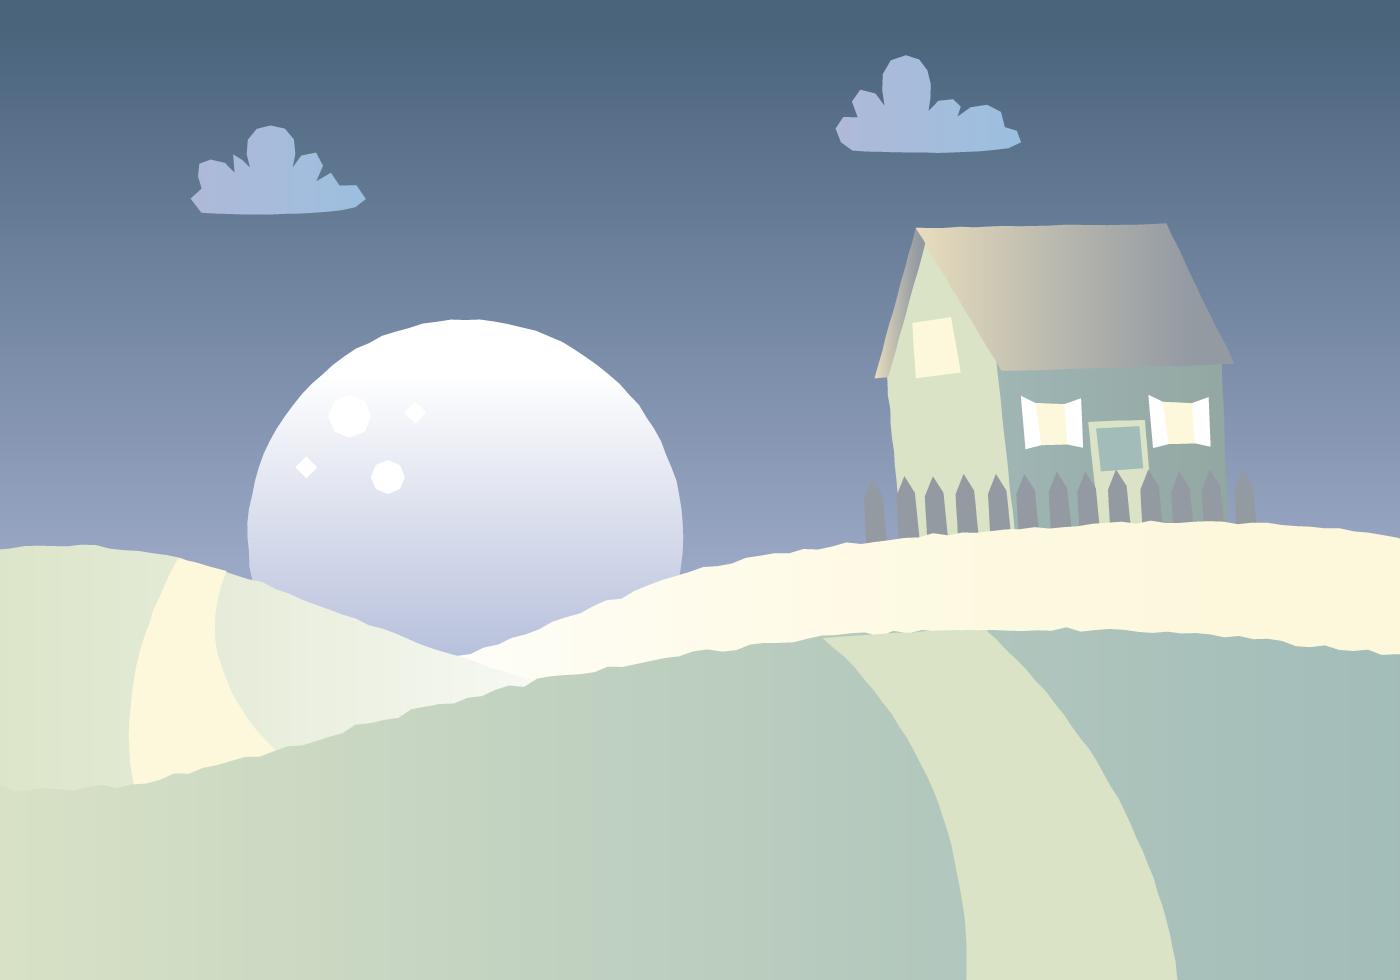 Night Time Cartoon Landscape Download Free Vector Art